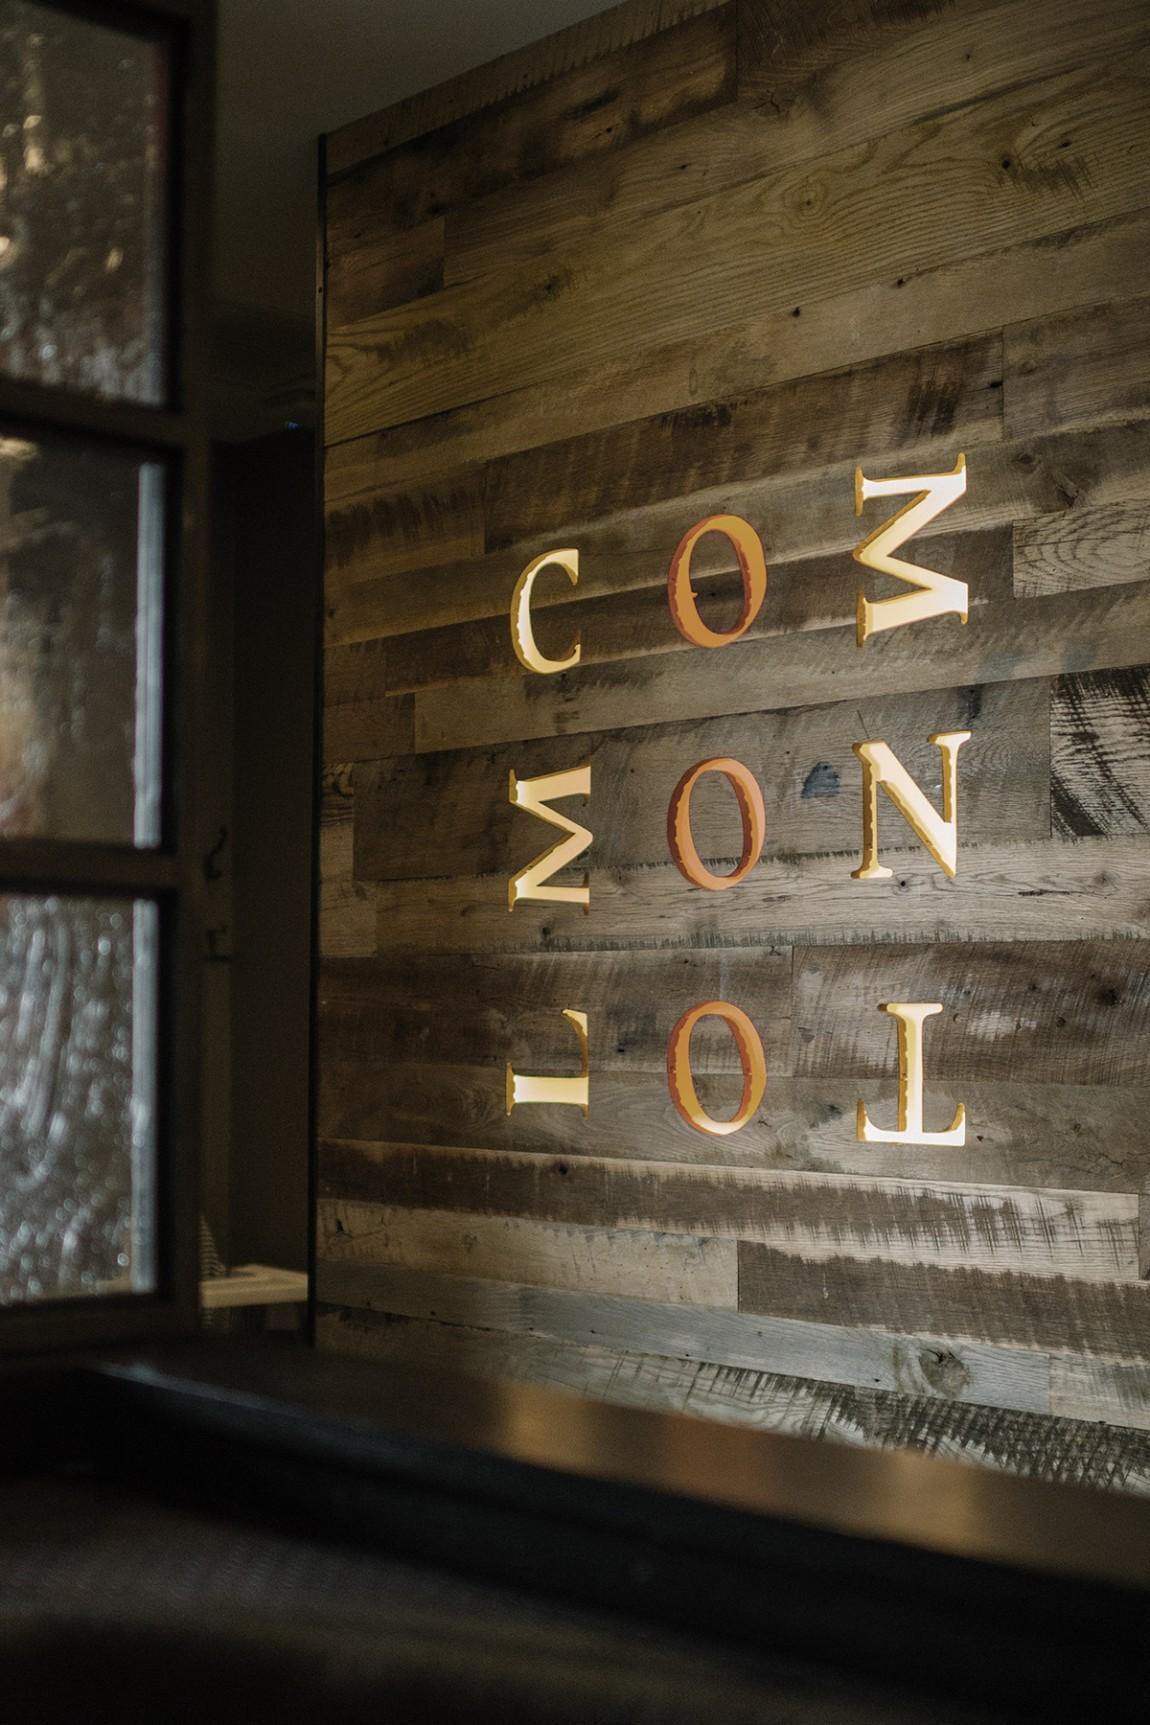 Common Lot餐饮品牌vi设计, 背景墙设计